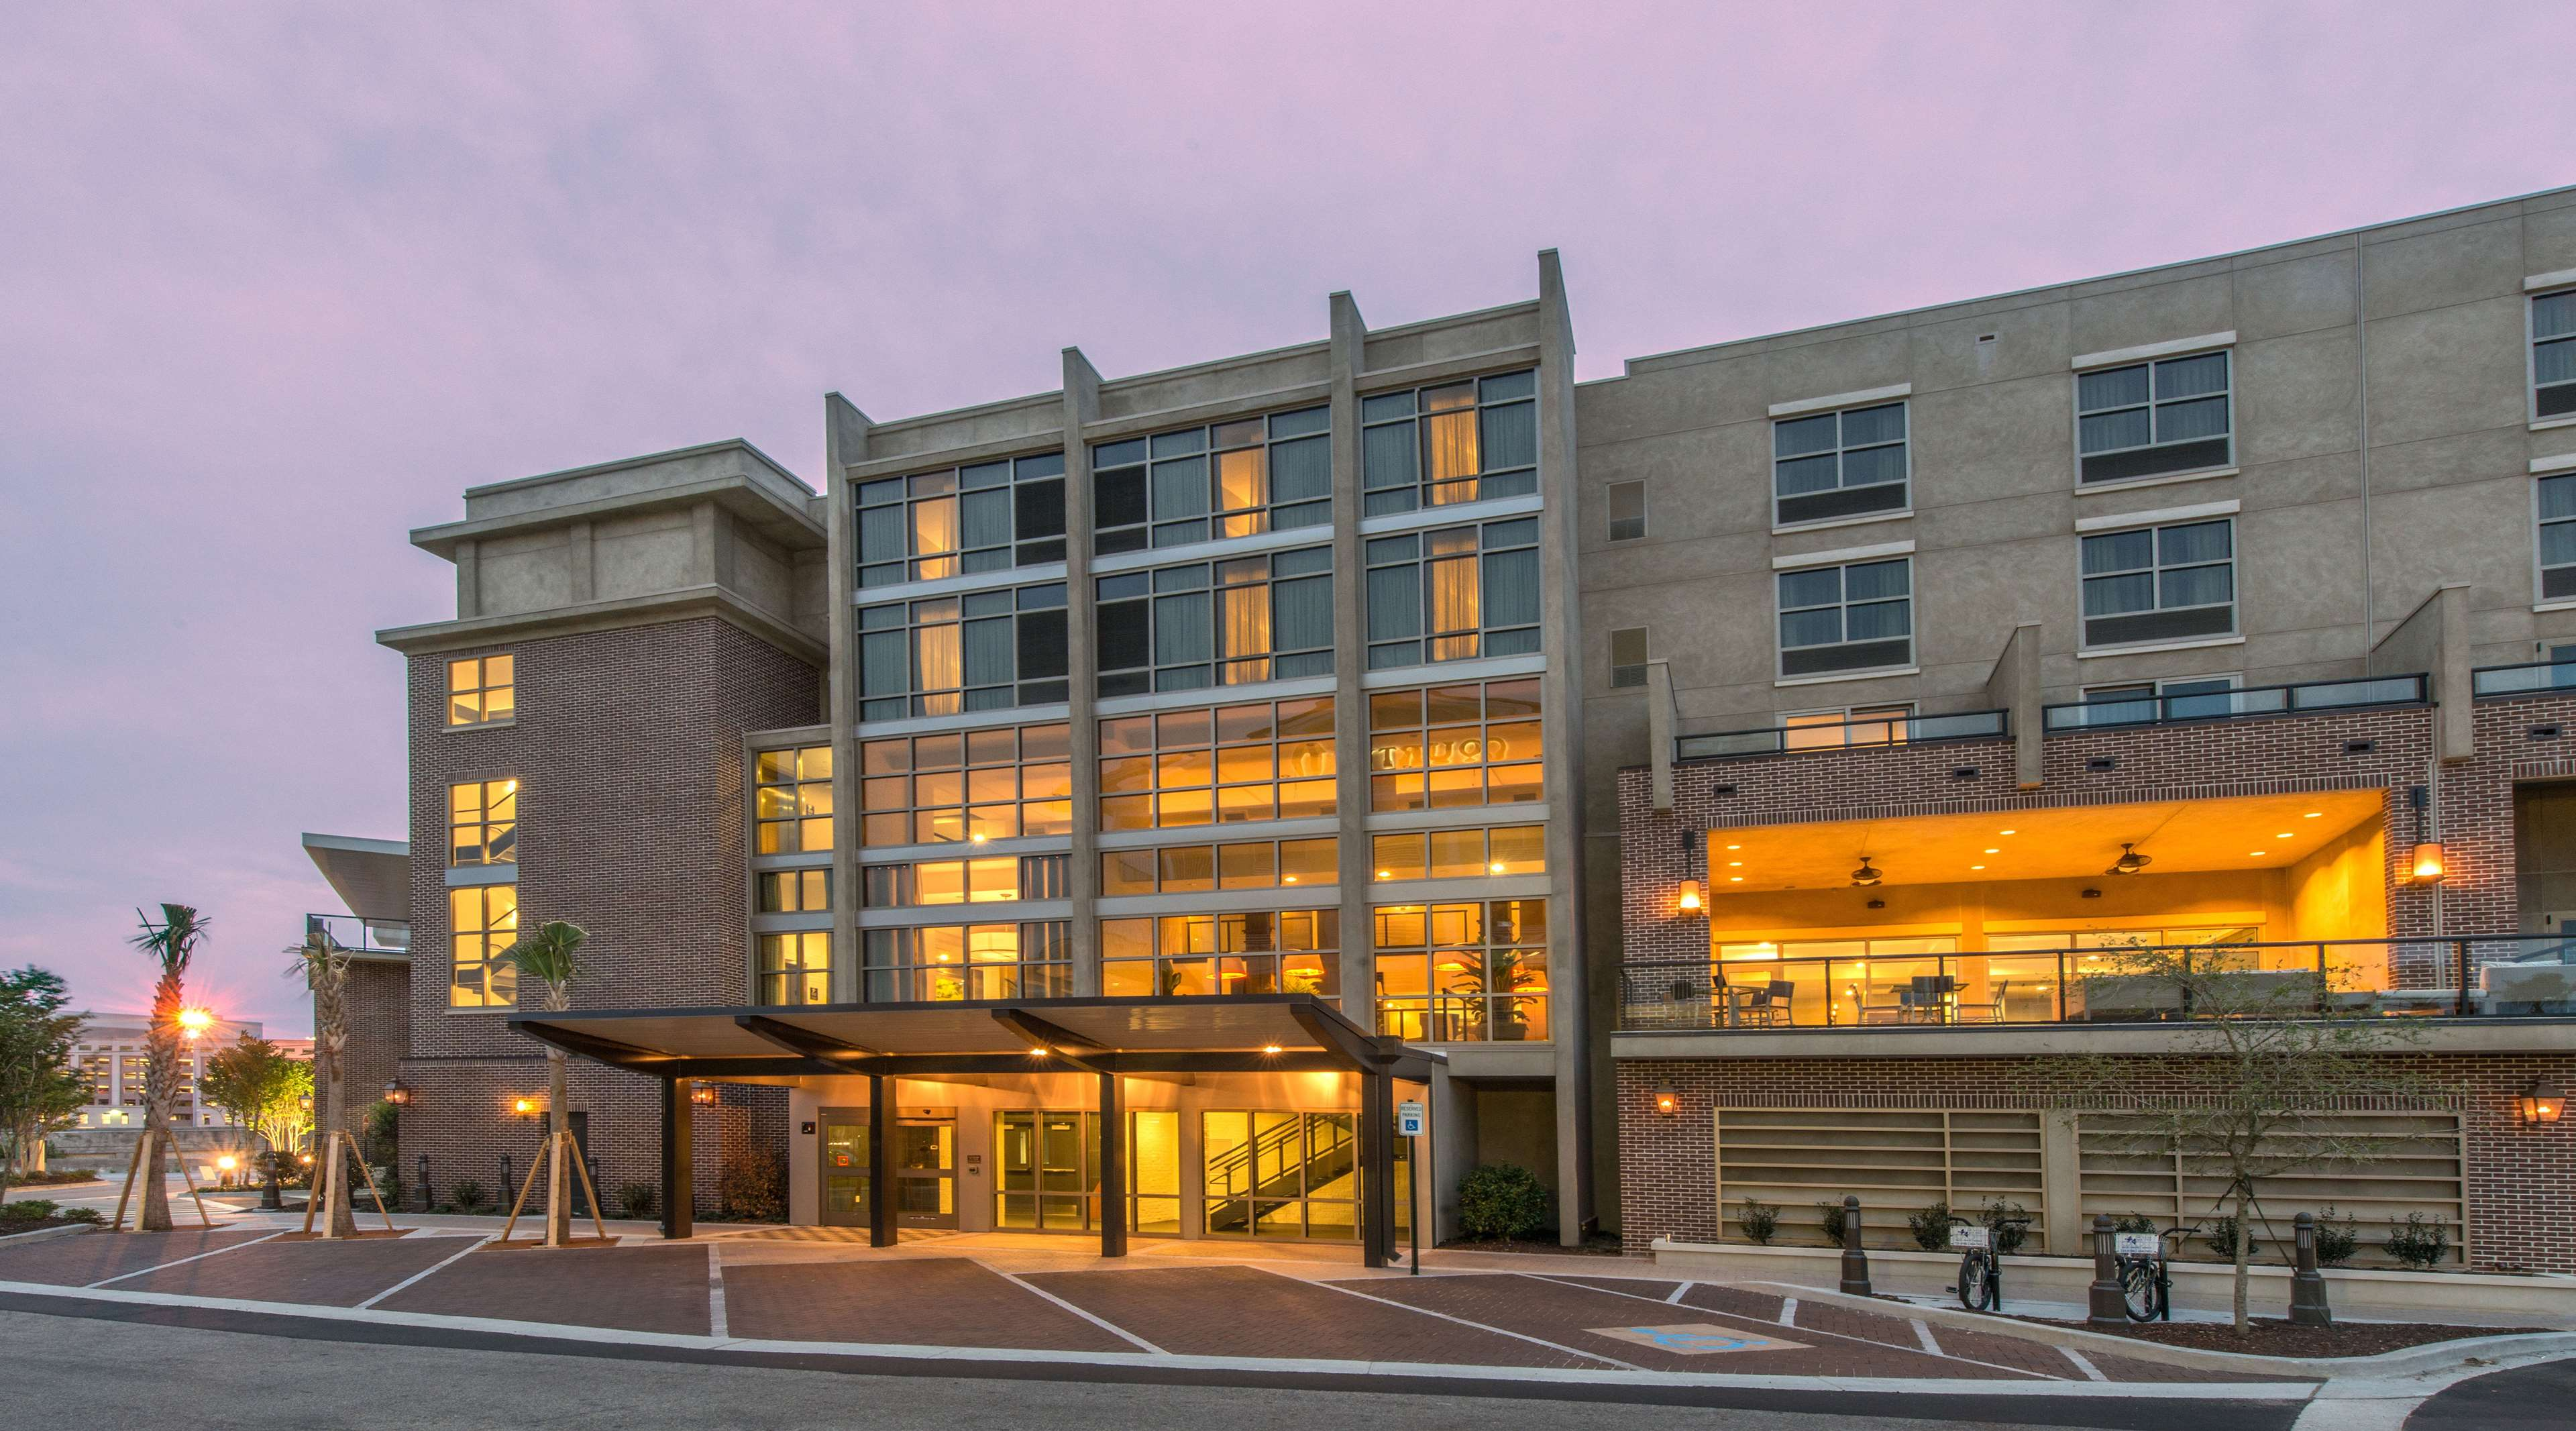 Hilton Garden Inn Charleston Waterfront/Downtown image 1